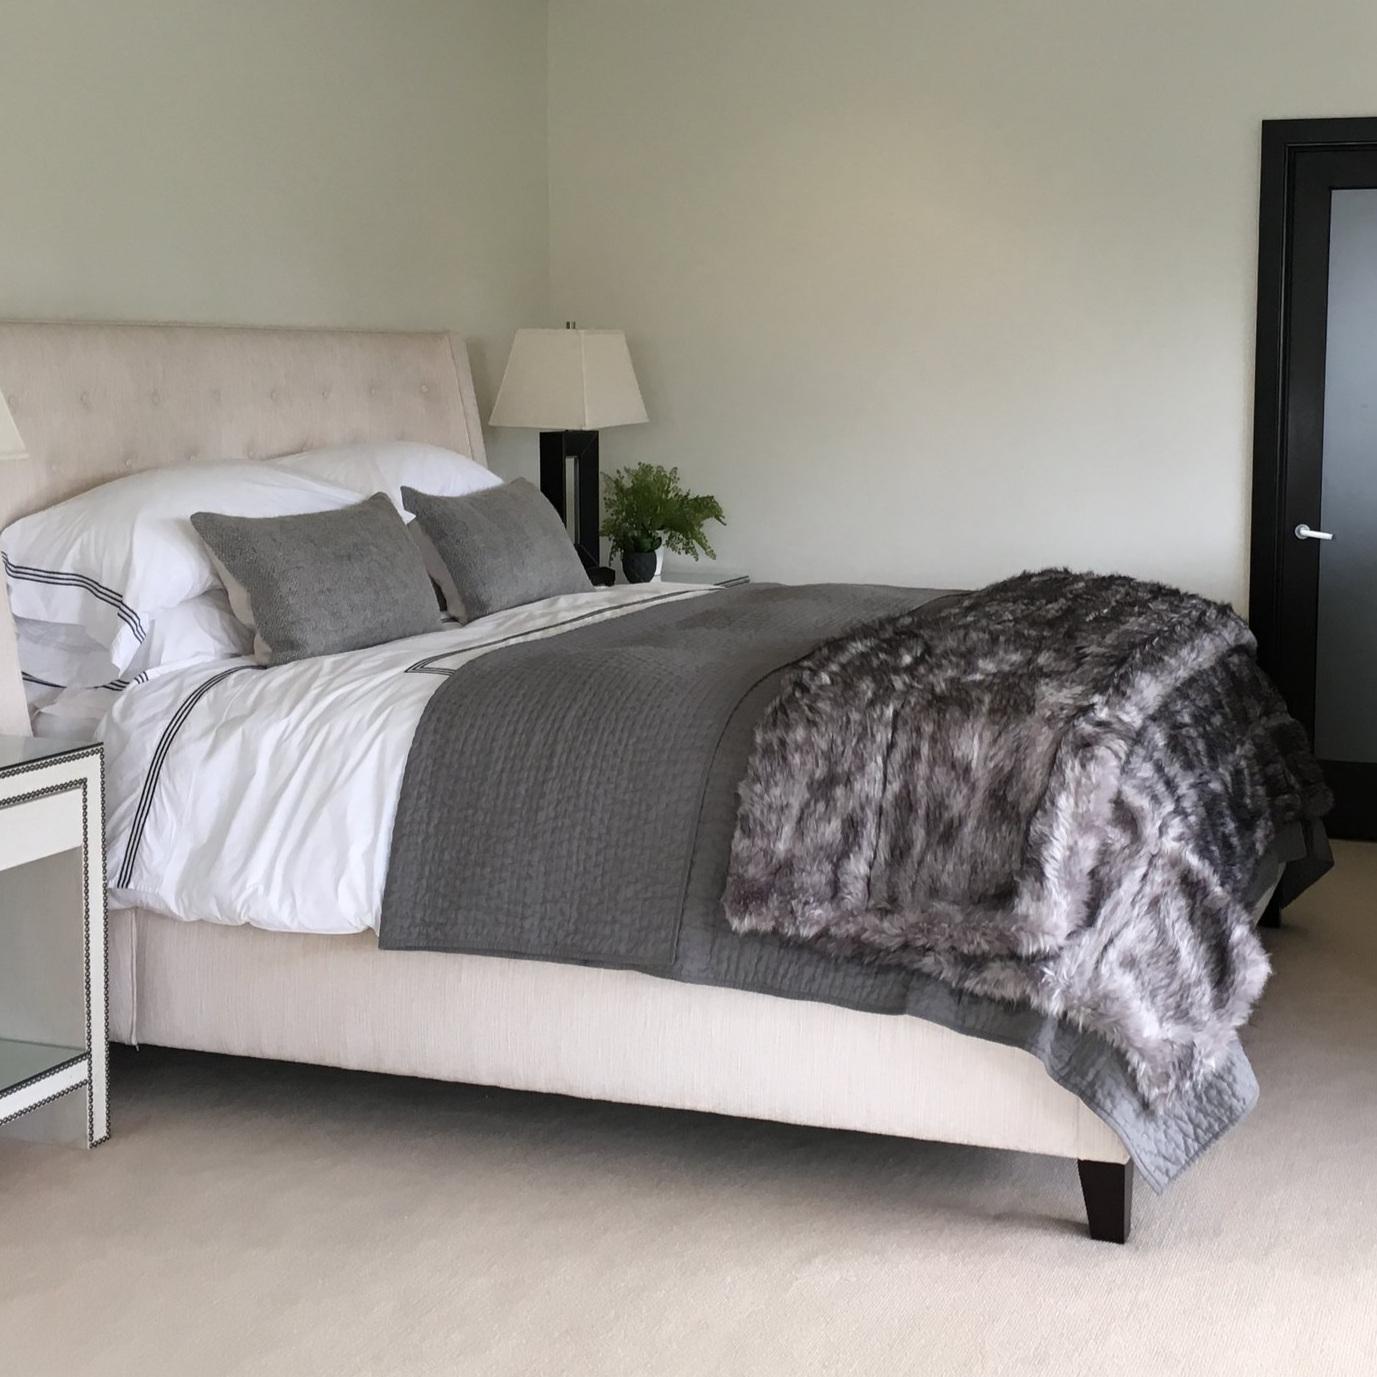 bachelor's master bedroom - coming soon…